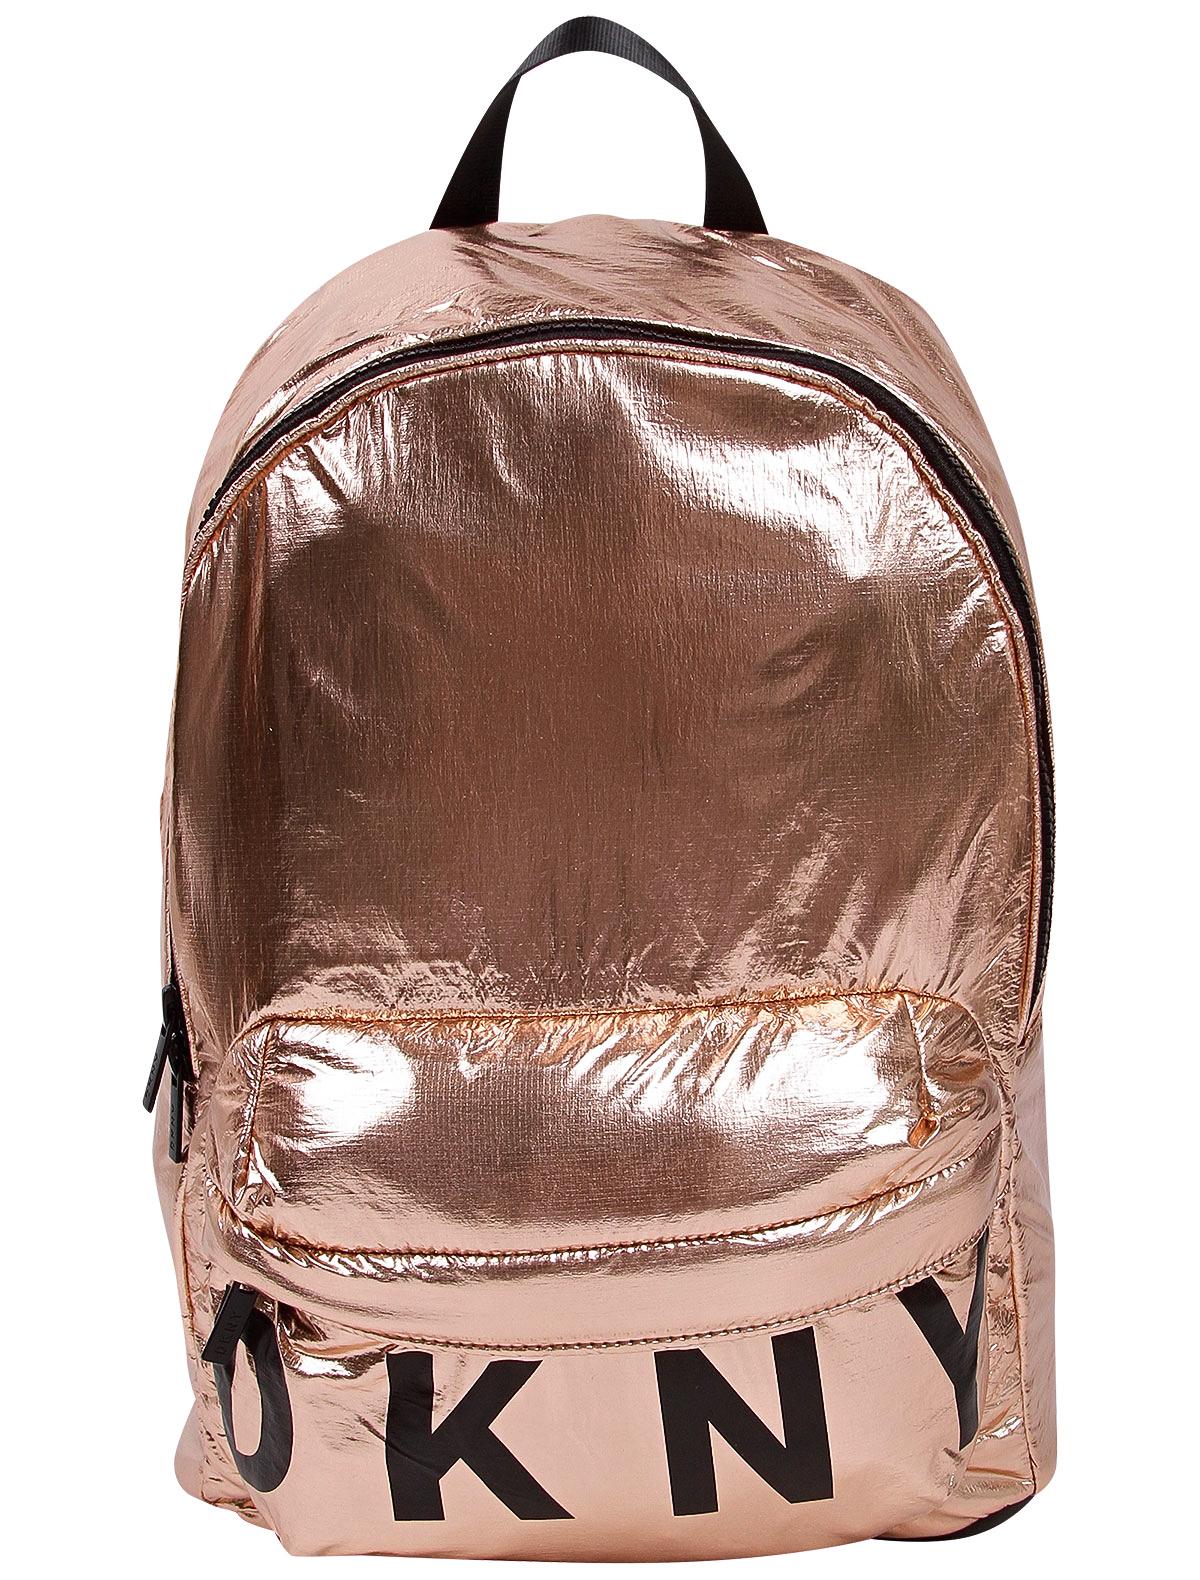 Рюкзак DKNY 2310462 оранжевого цвета